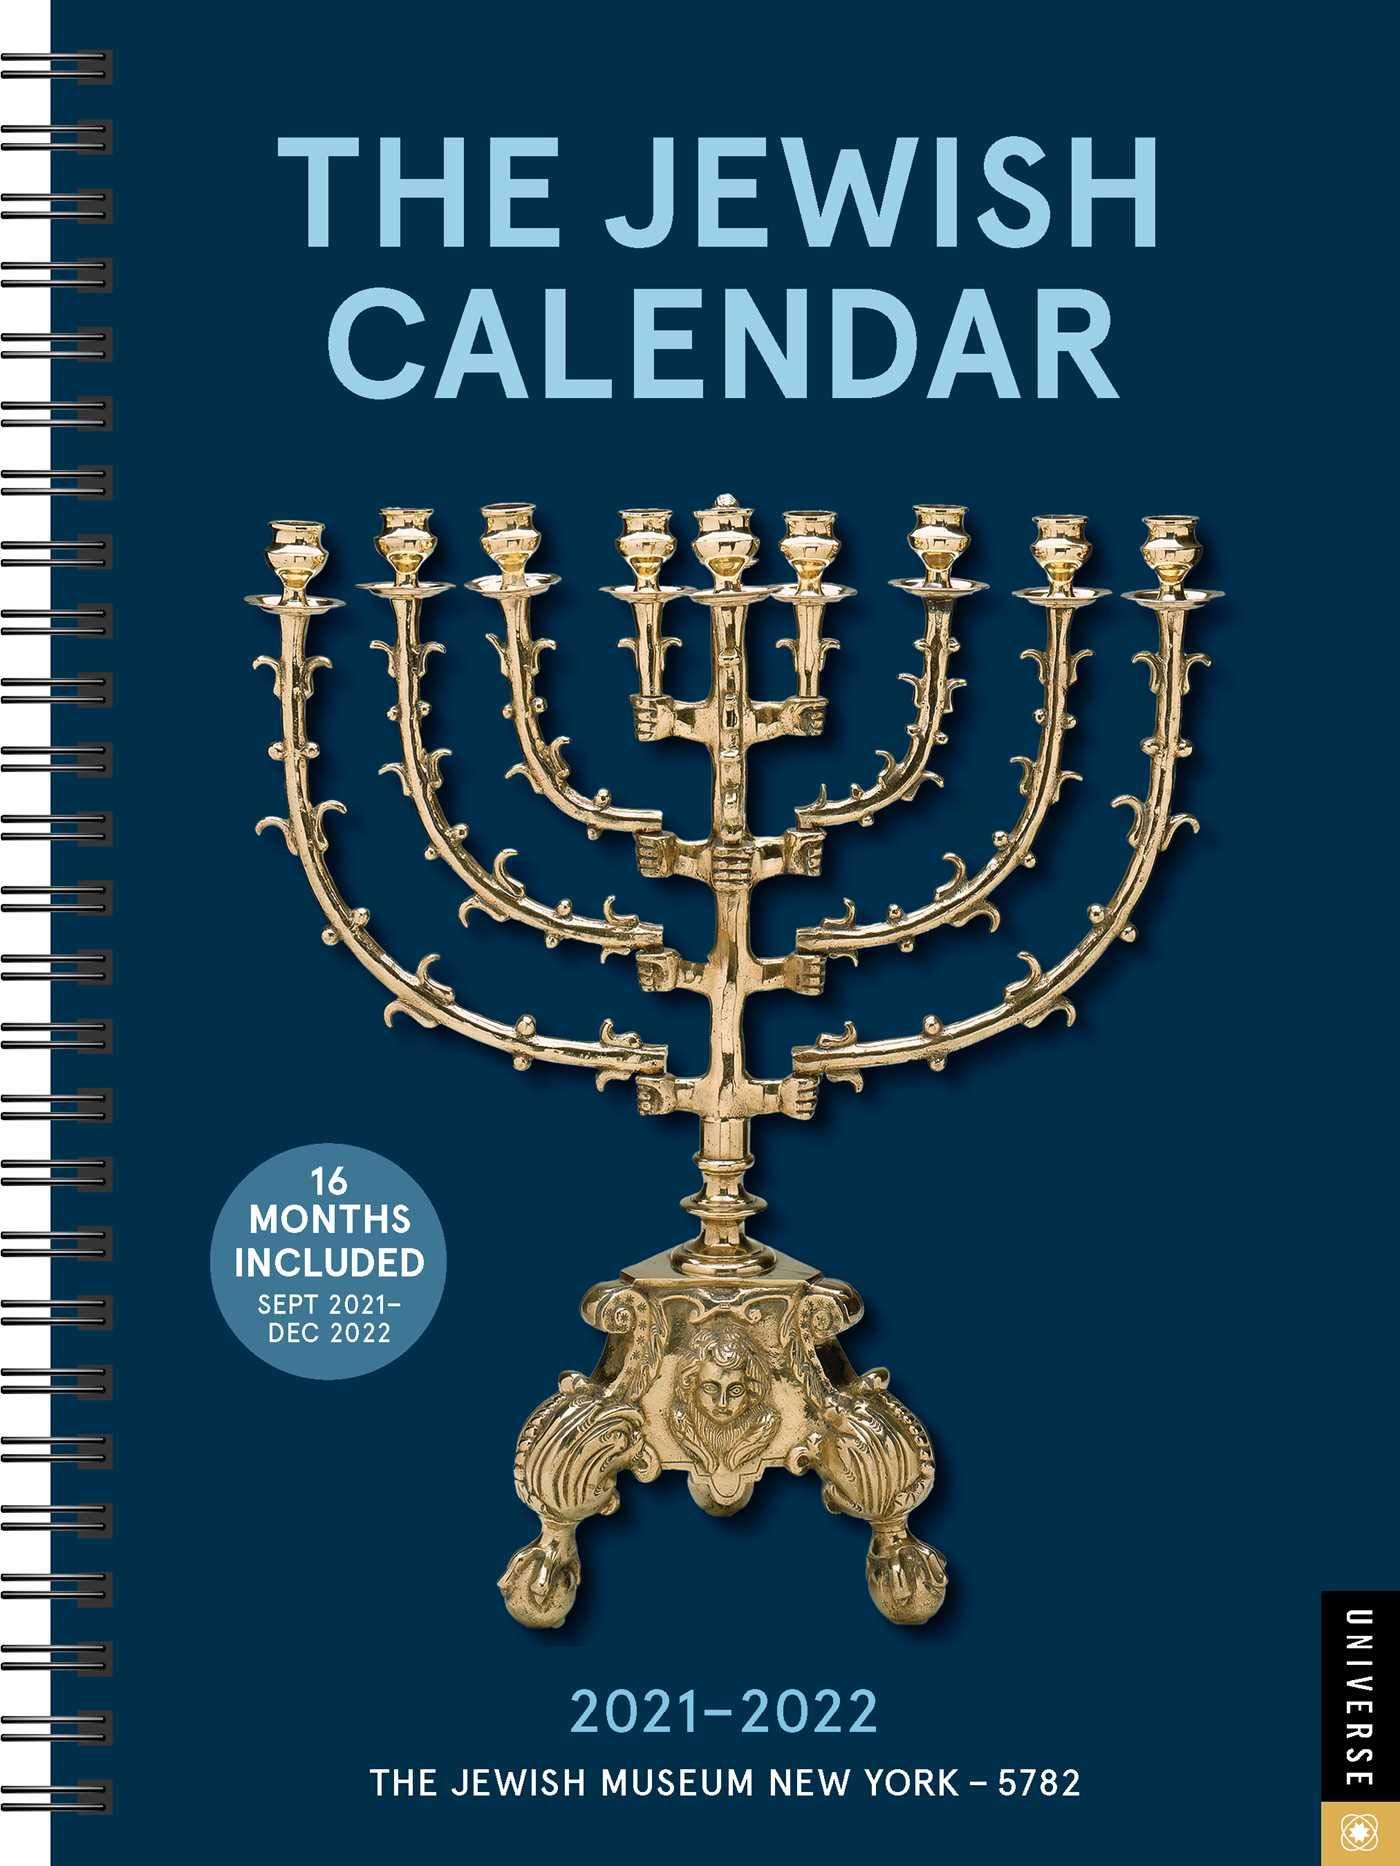 Jewish Calendar 2022.Buy The Jewish Calendar 16 Month 2021 2022 Engagement Calendar Jewish Year 5782 Book Online At Low Prices In India The Jewish Calendar 16 Month 2021 2022 Engagement Calendar Jewish Year 5782 Reviews Ratings Amazon In